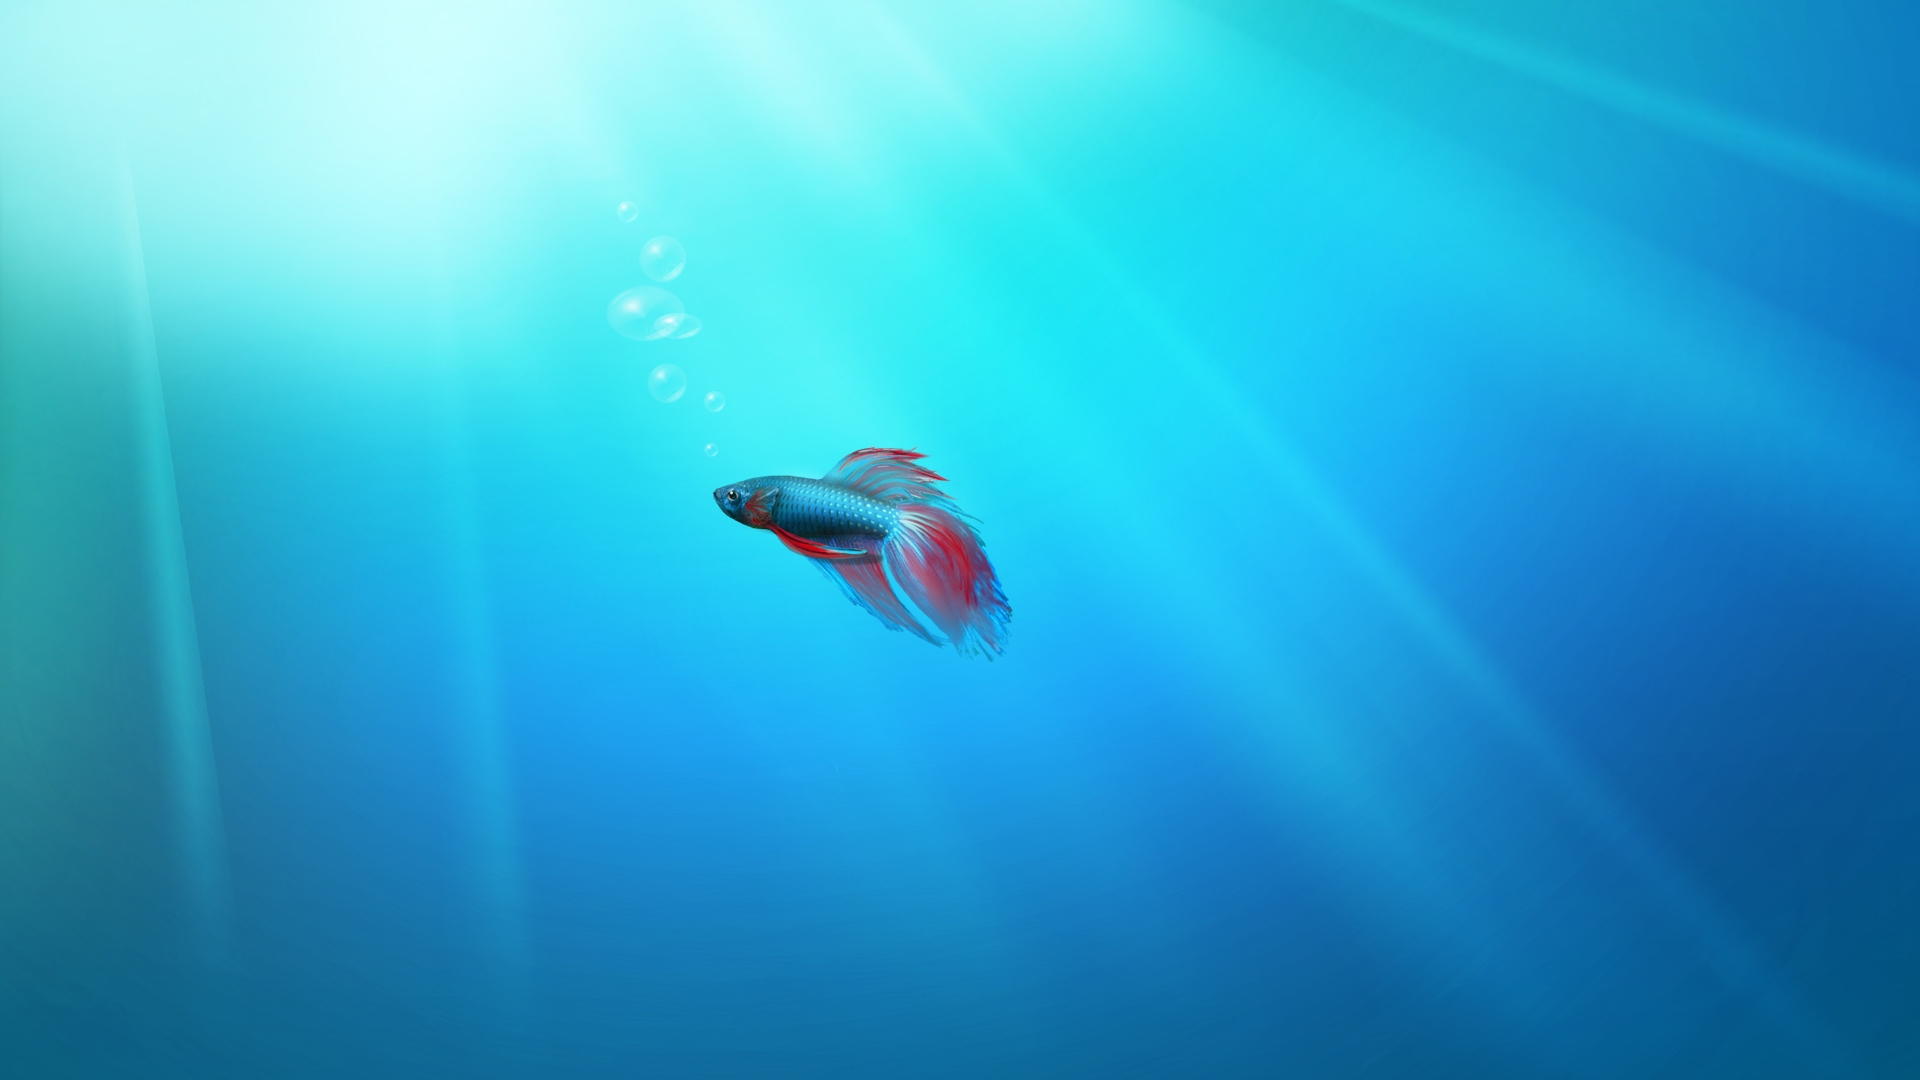 Iphone 7 Fish Wallpaper Hd Windows 7 Fish Wallpaper Hd Wallpapers